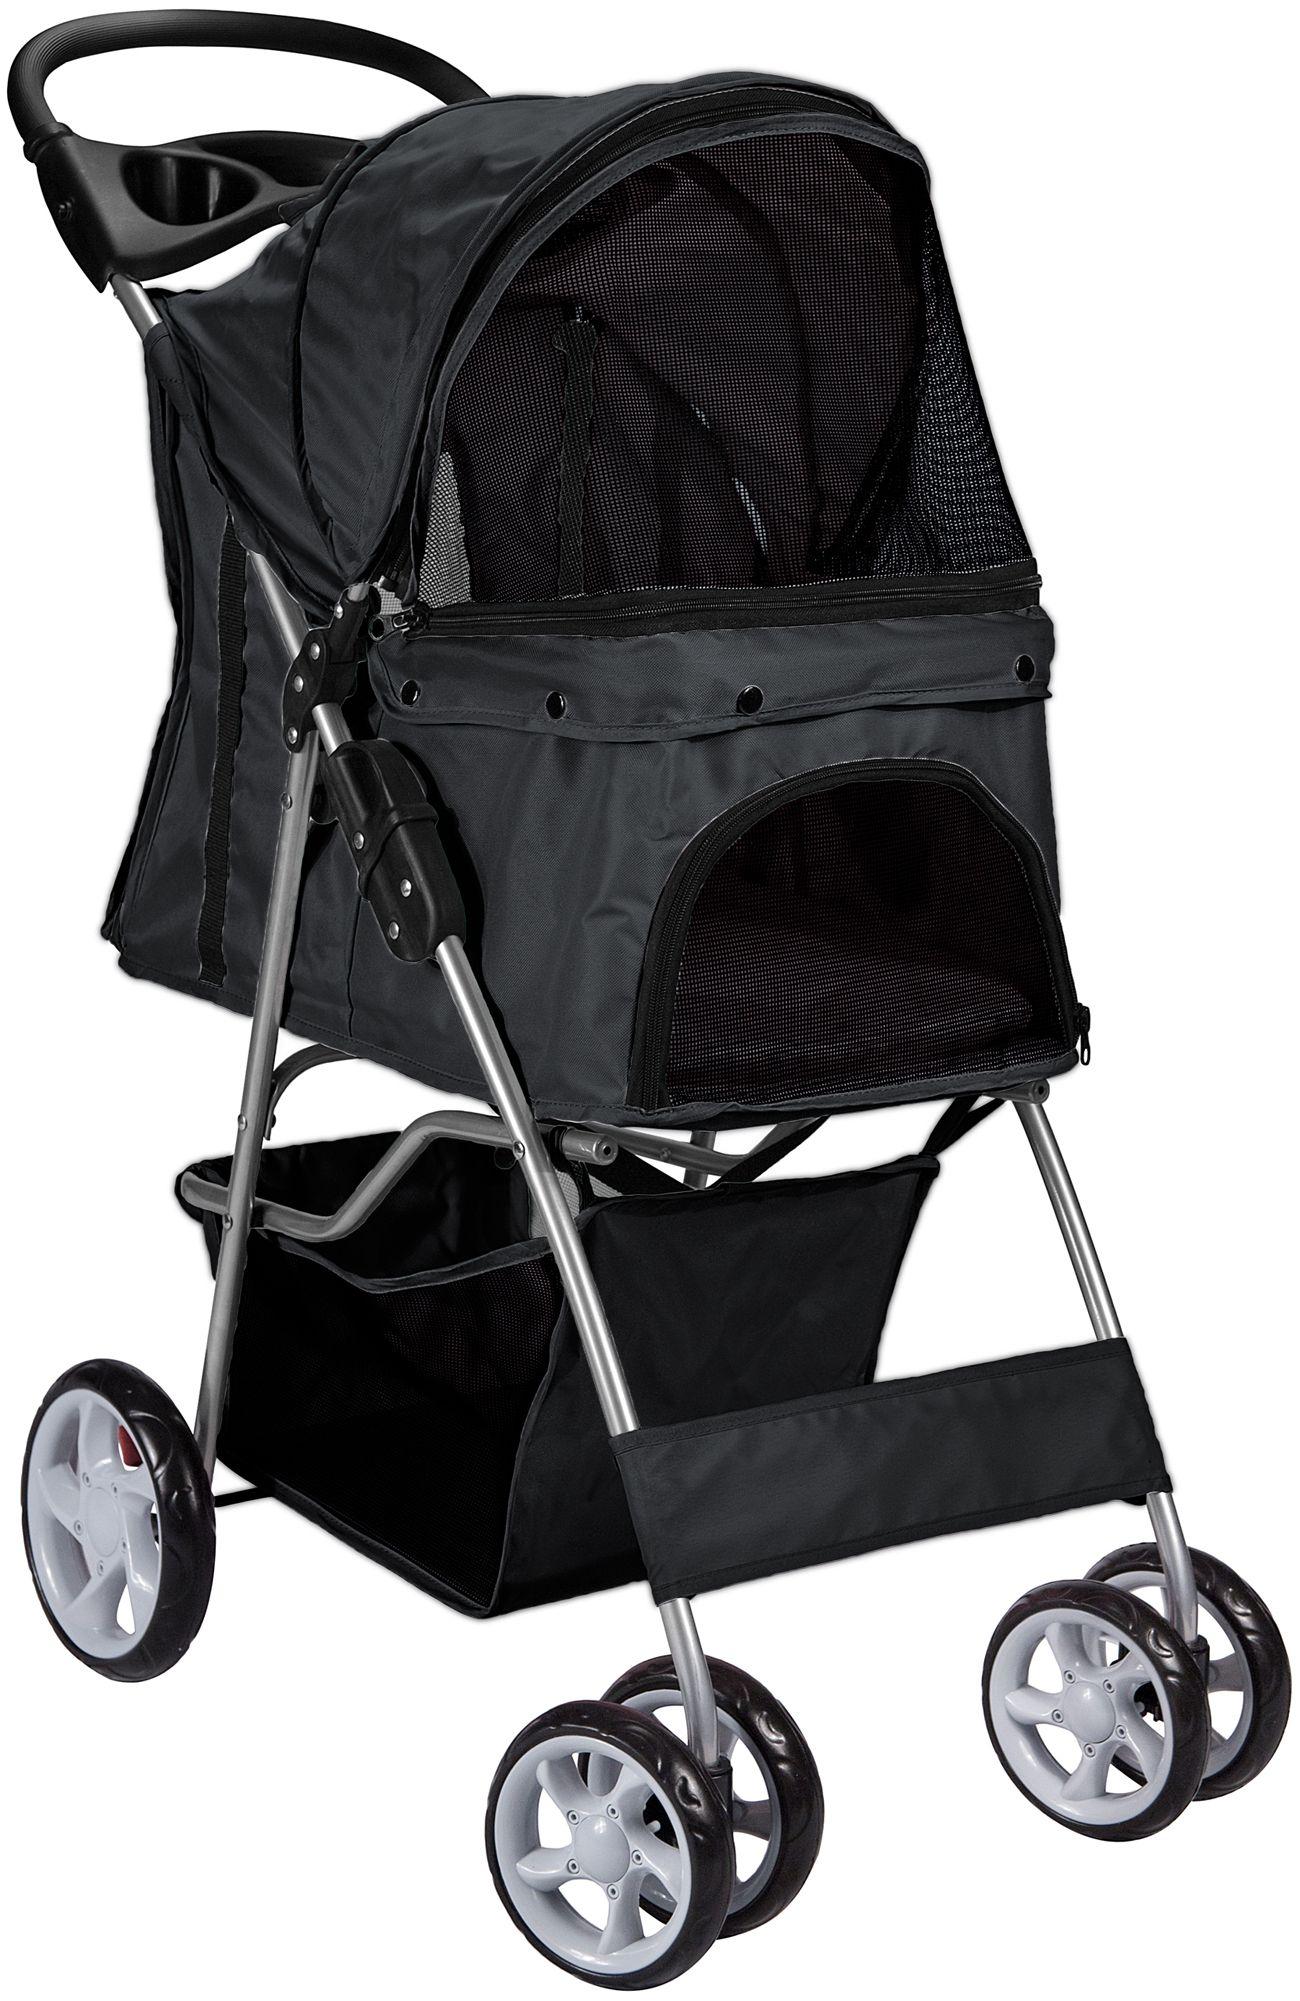 23++ Pet gear stroller walmart info